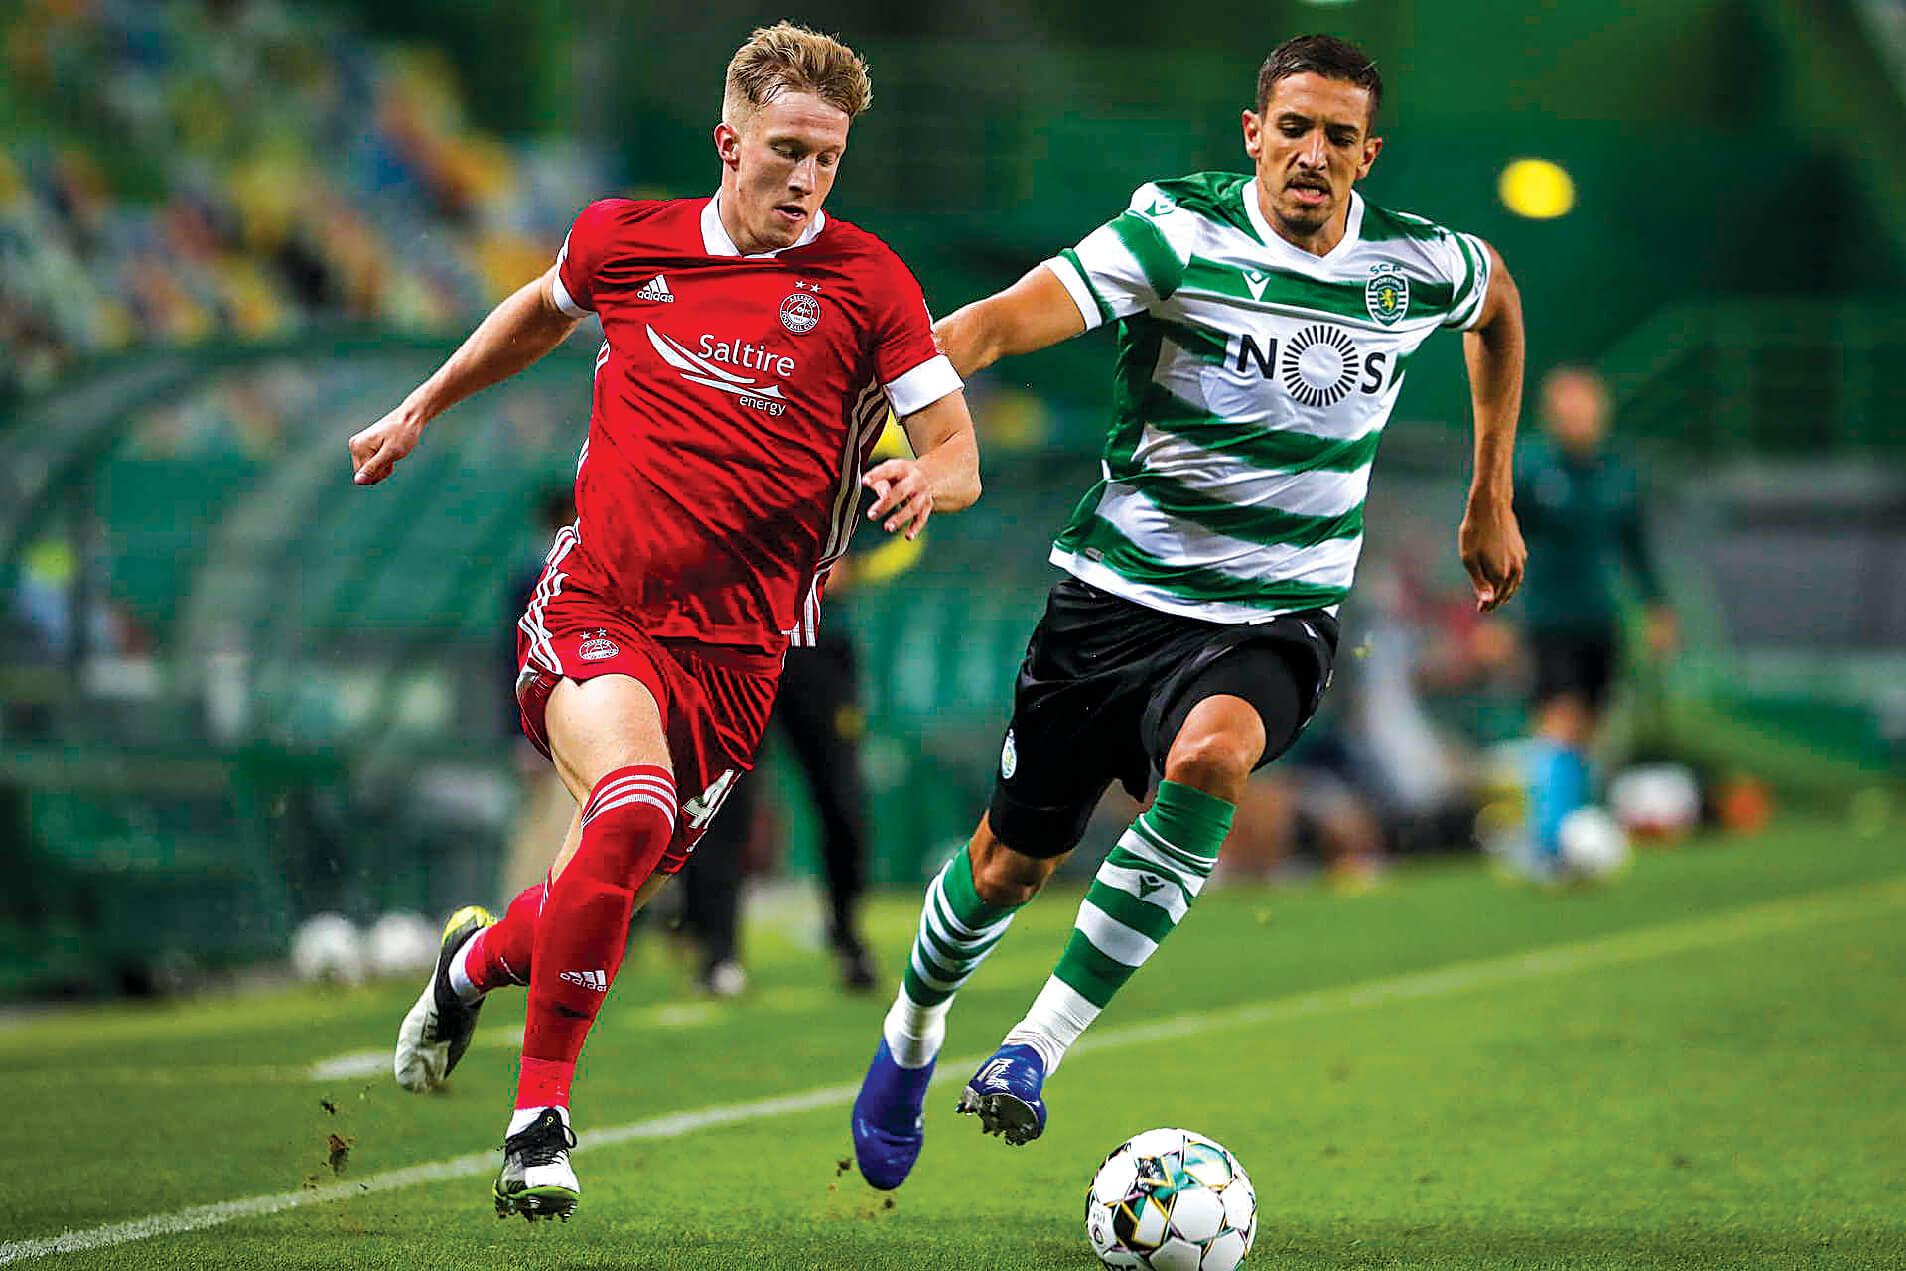 Tiago Tomás coloca Sporting no play-off da Liga Europa - milenio stadium - portugal